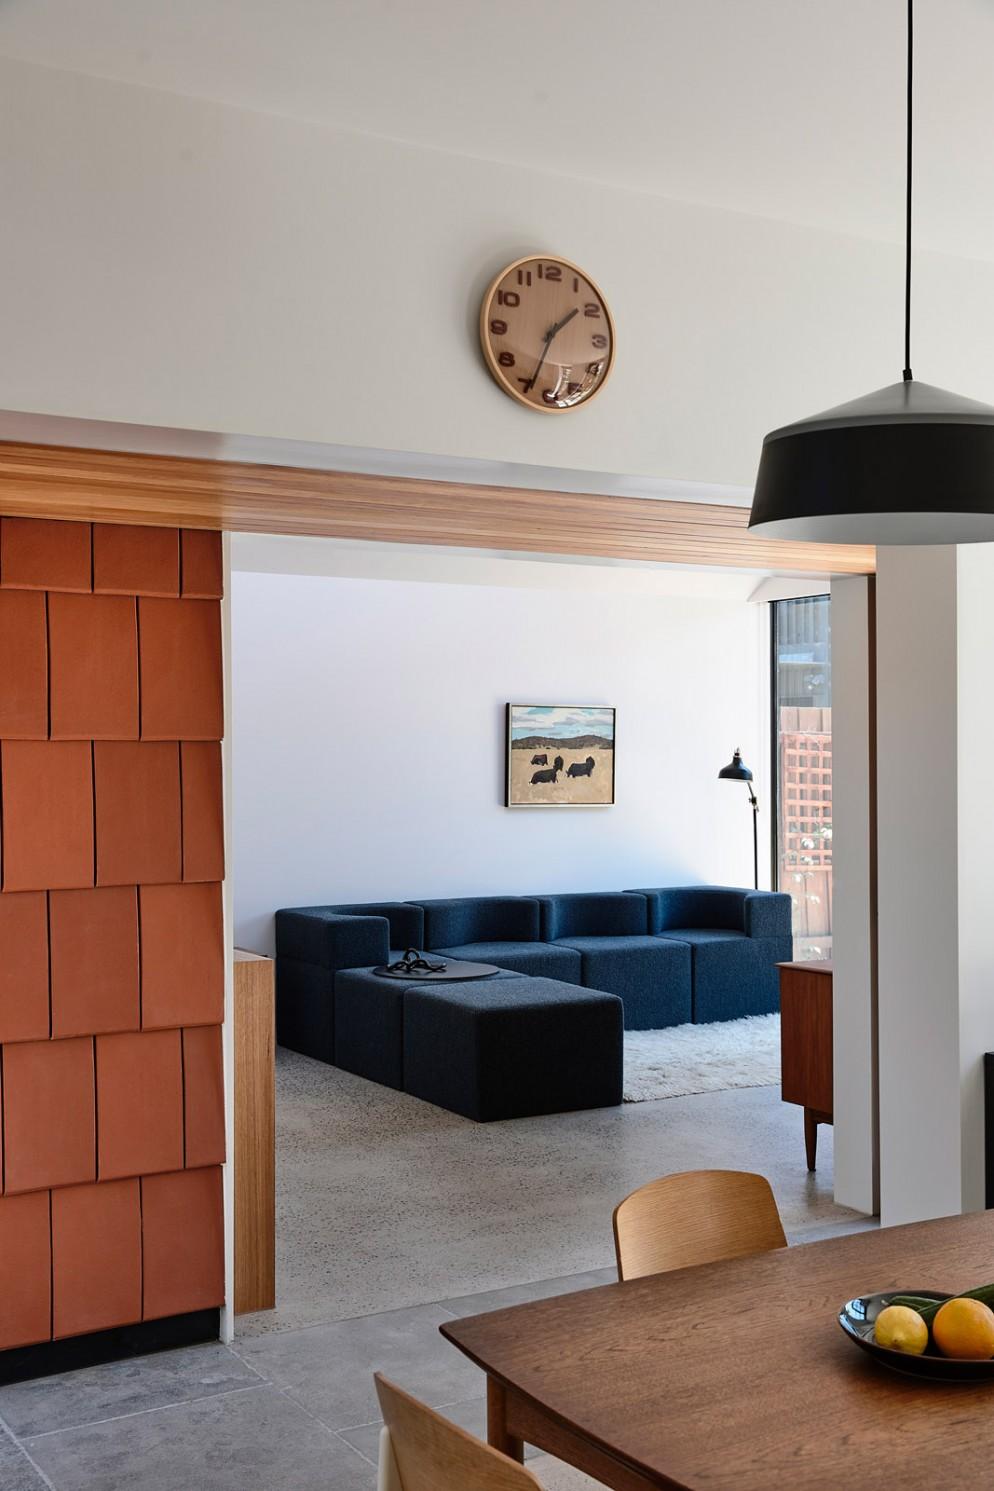 08 AMA-Terracotta_House_Derek_Swalwell